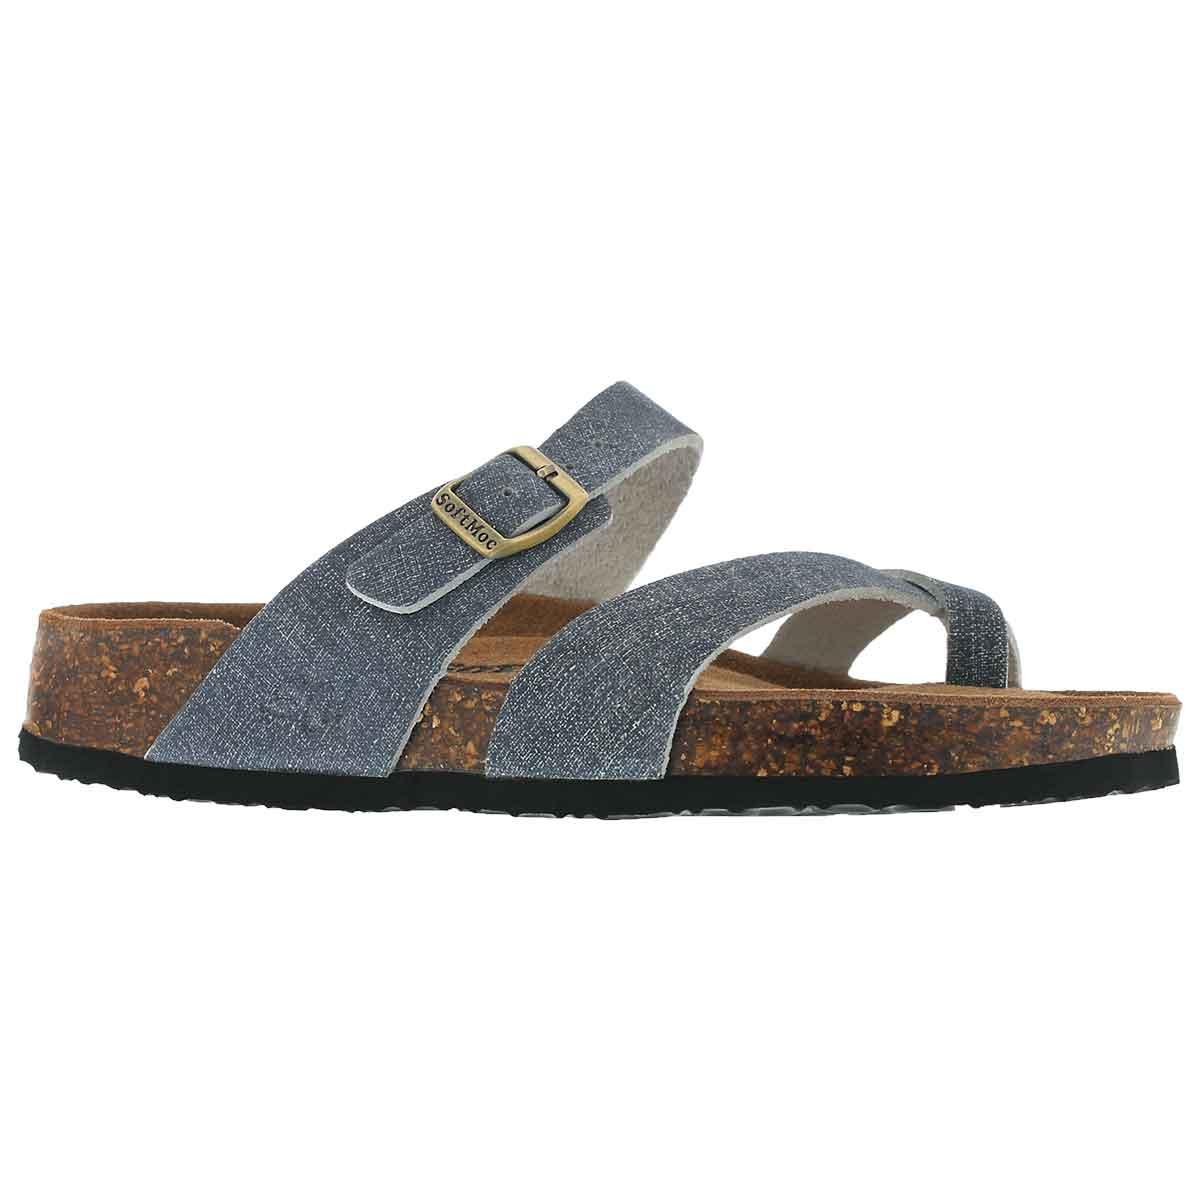 Women's ALICIA 5 denim memory foam sandals